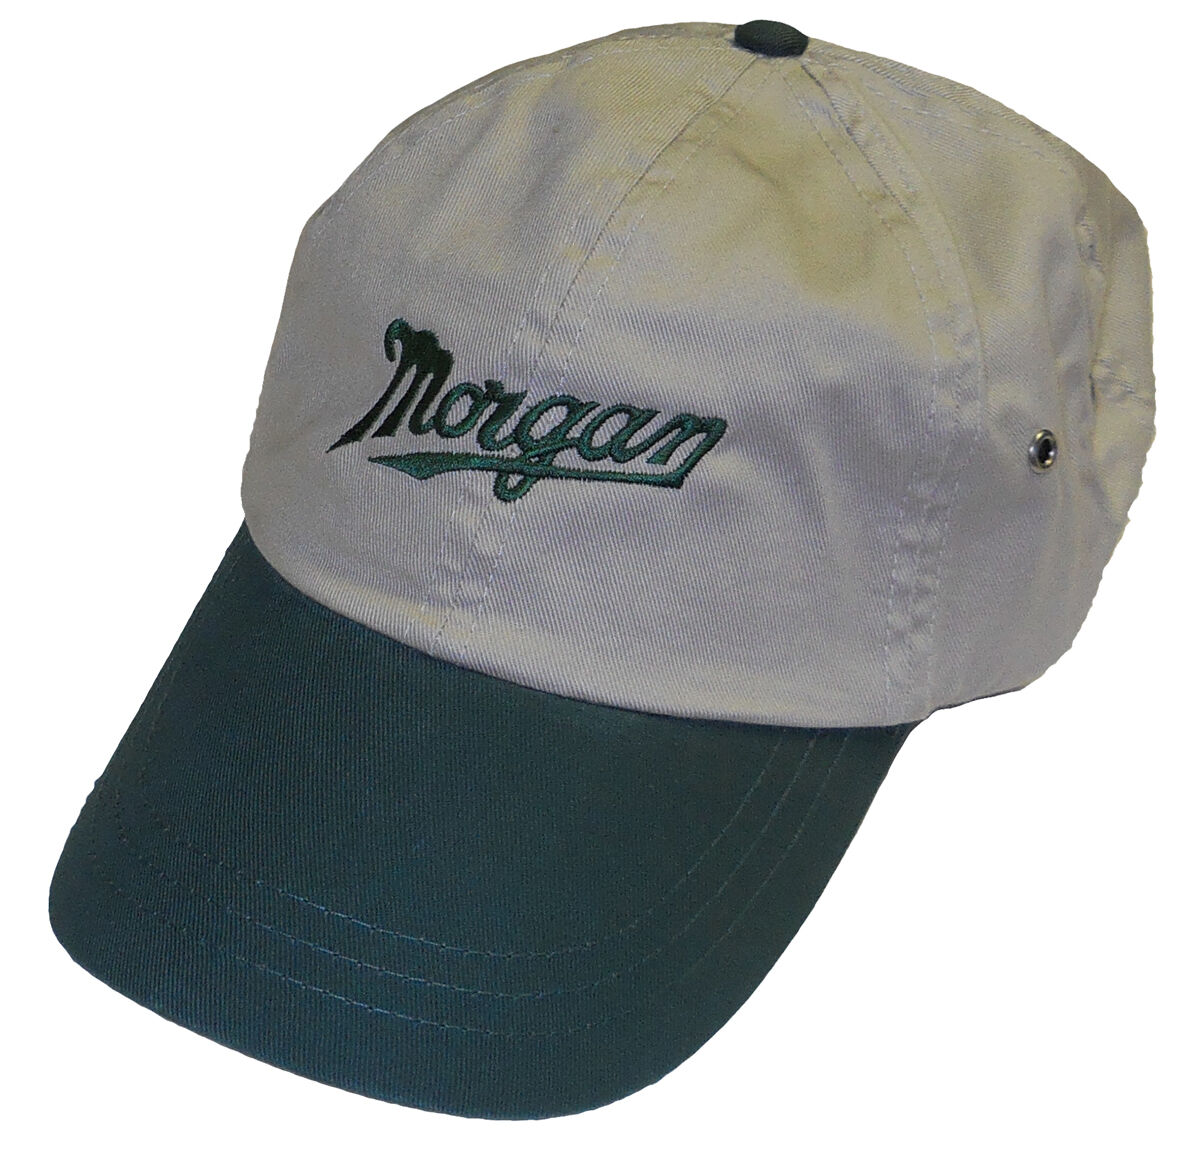 Morgan script embroidered hat